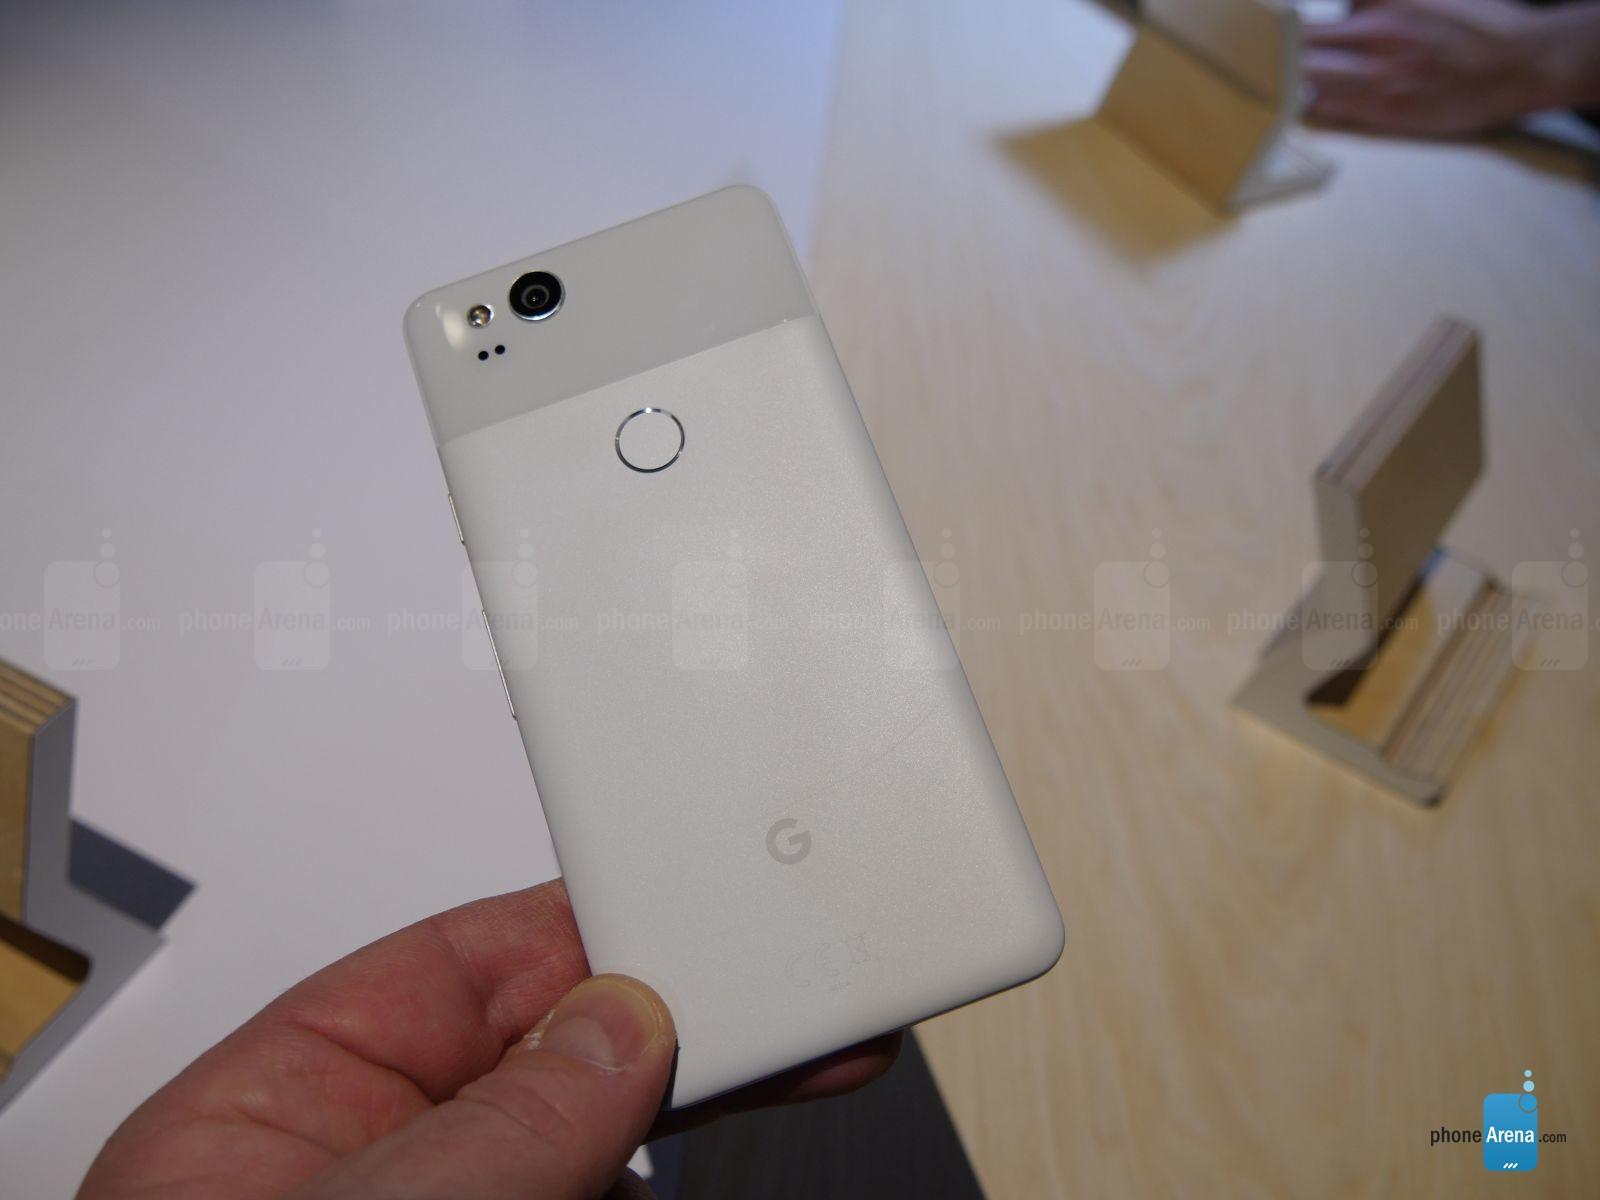 https://i-cdn.phonearena.com/images/articles/303836-image/Google-Pixel-2.jpg